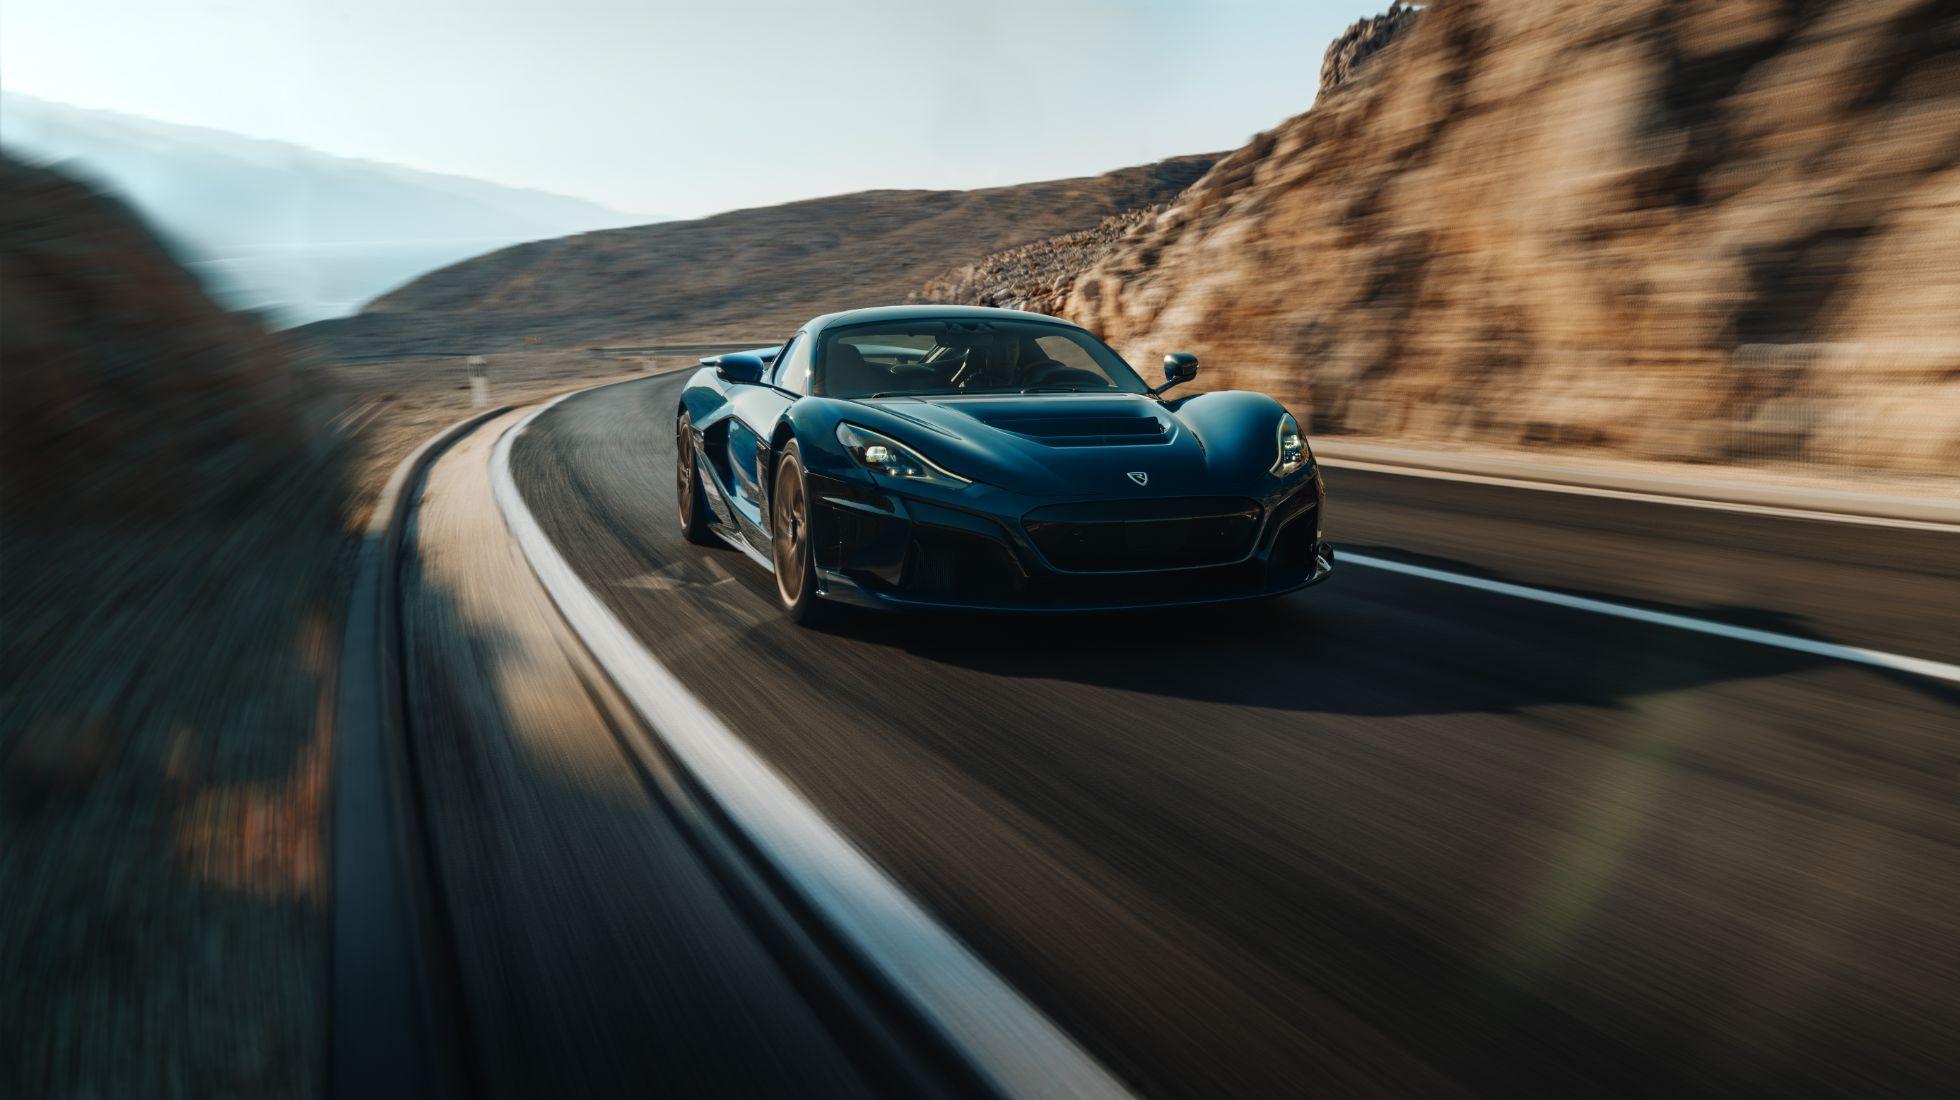 Rimac Nevera EV hypercar unveiled